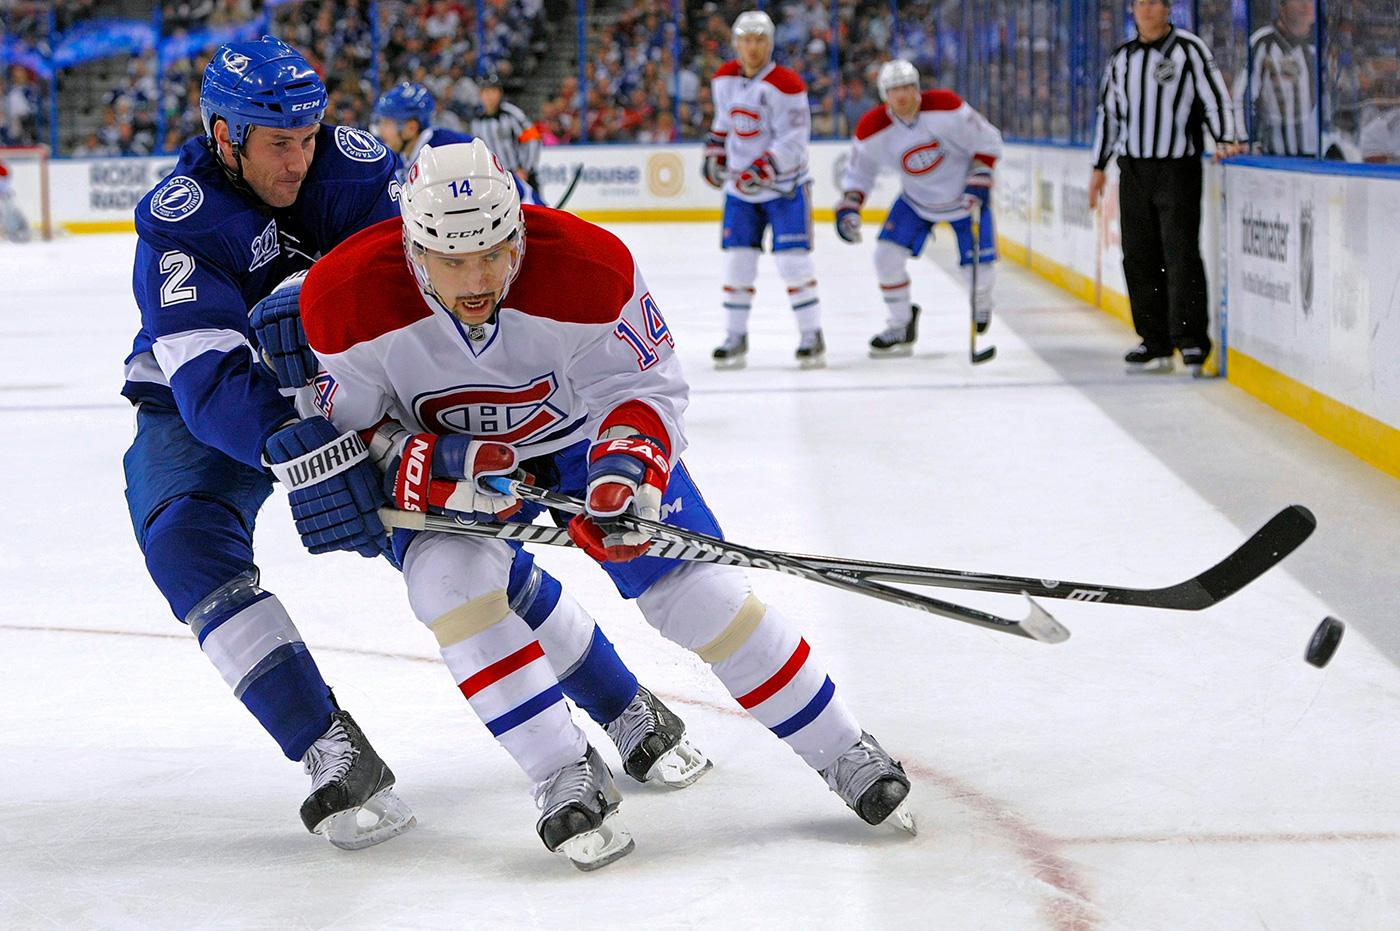 LNH Canadiens